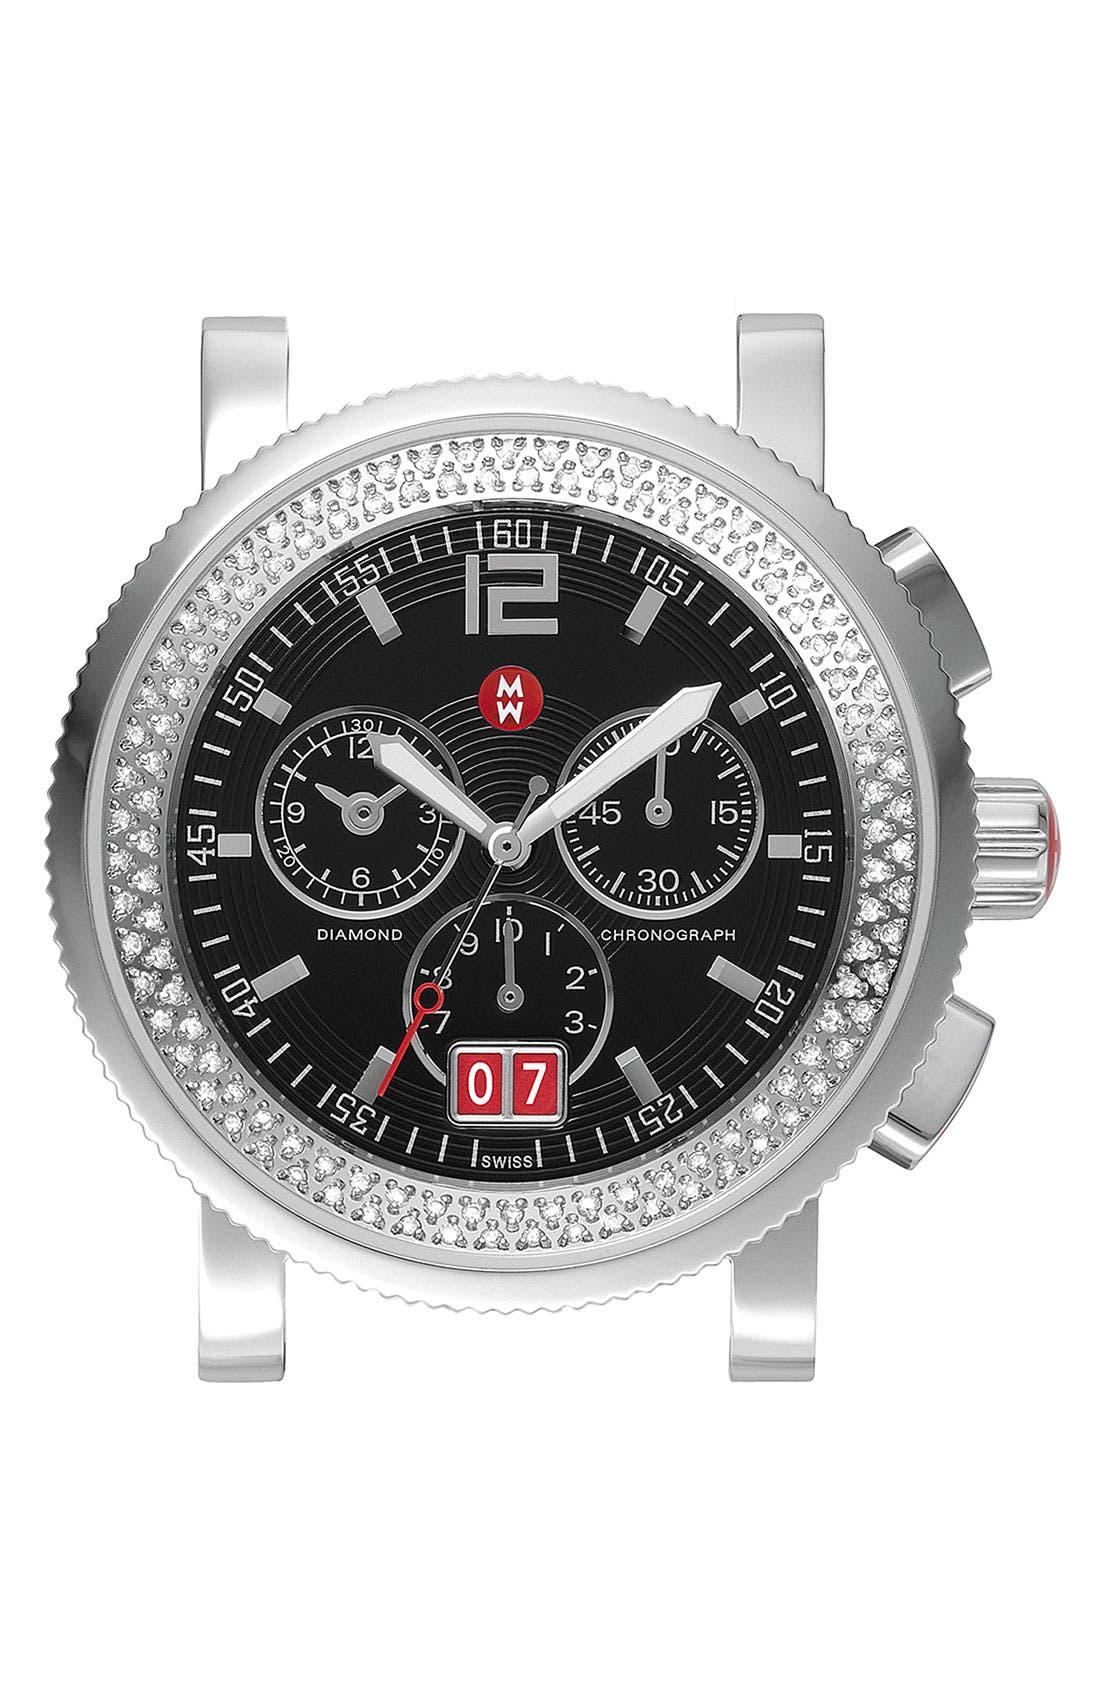 Main Image - MICHELE 'Sport Sail - Large' Diamond Black Dial Watch Case